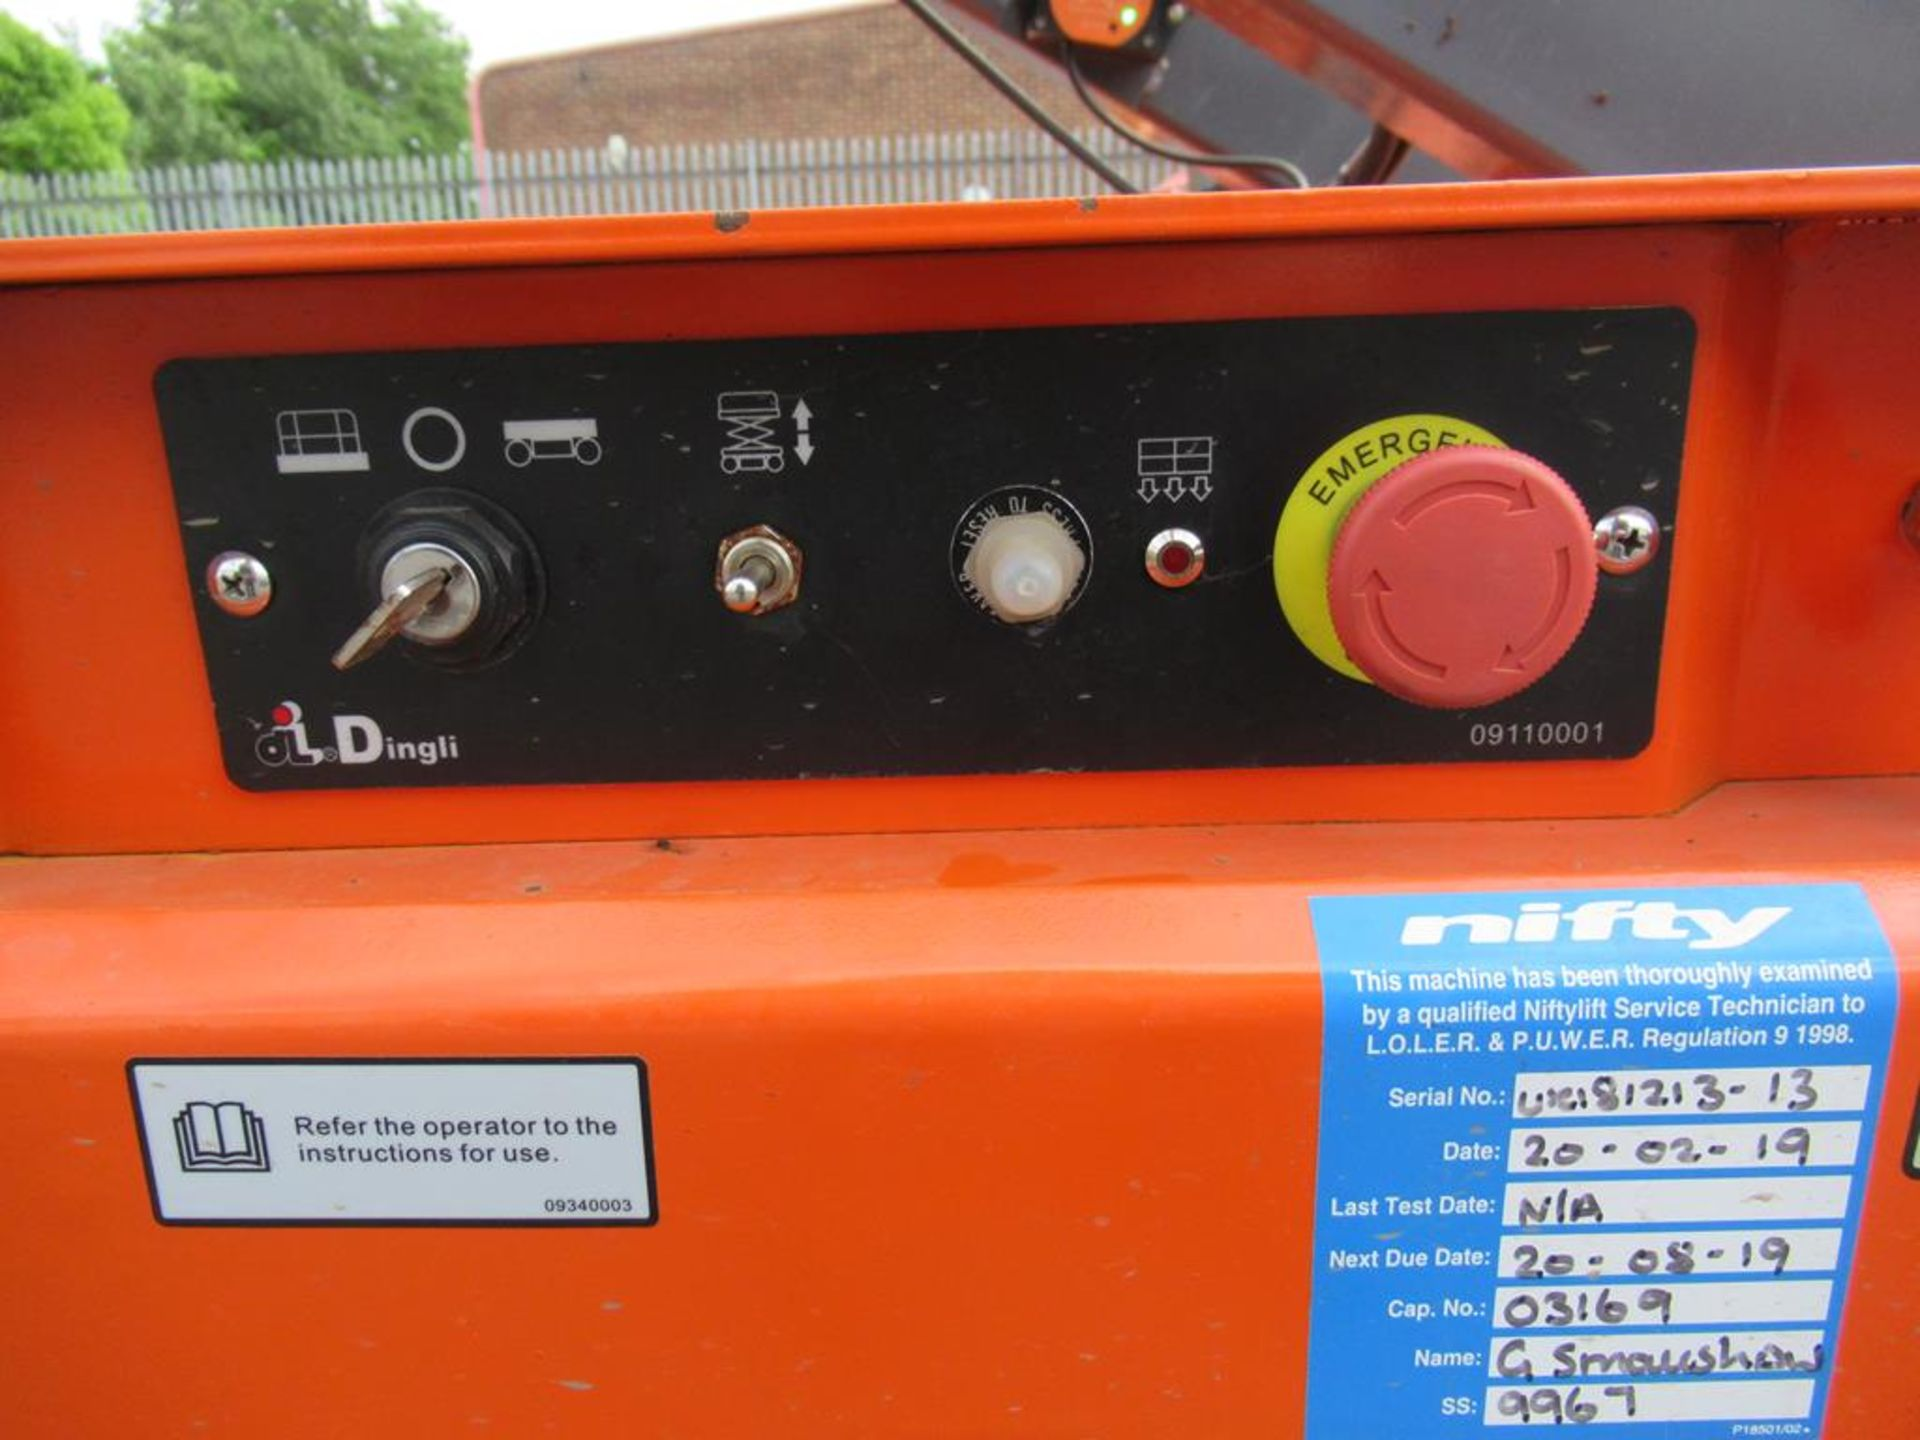 Dingli JCPT 1412 DC 24V electric scissor lift - Image 3 of 7